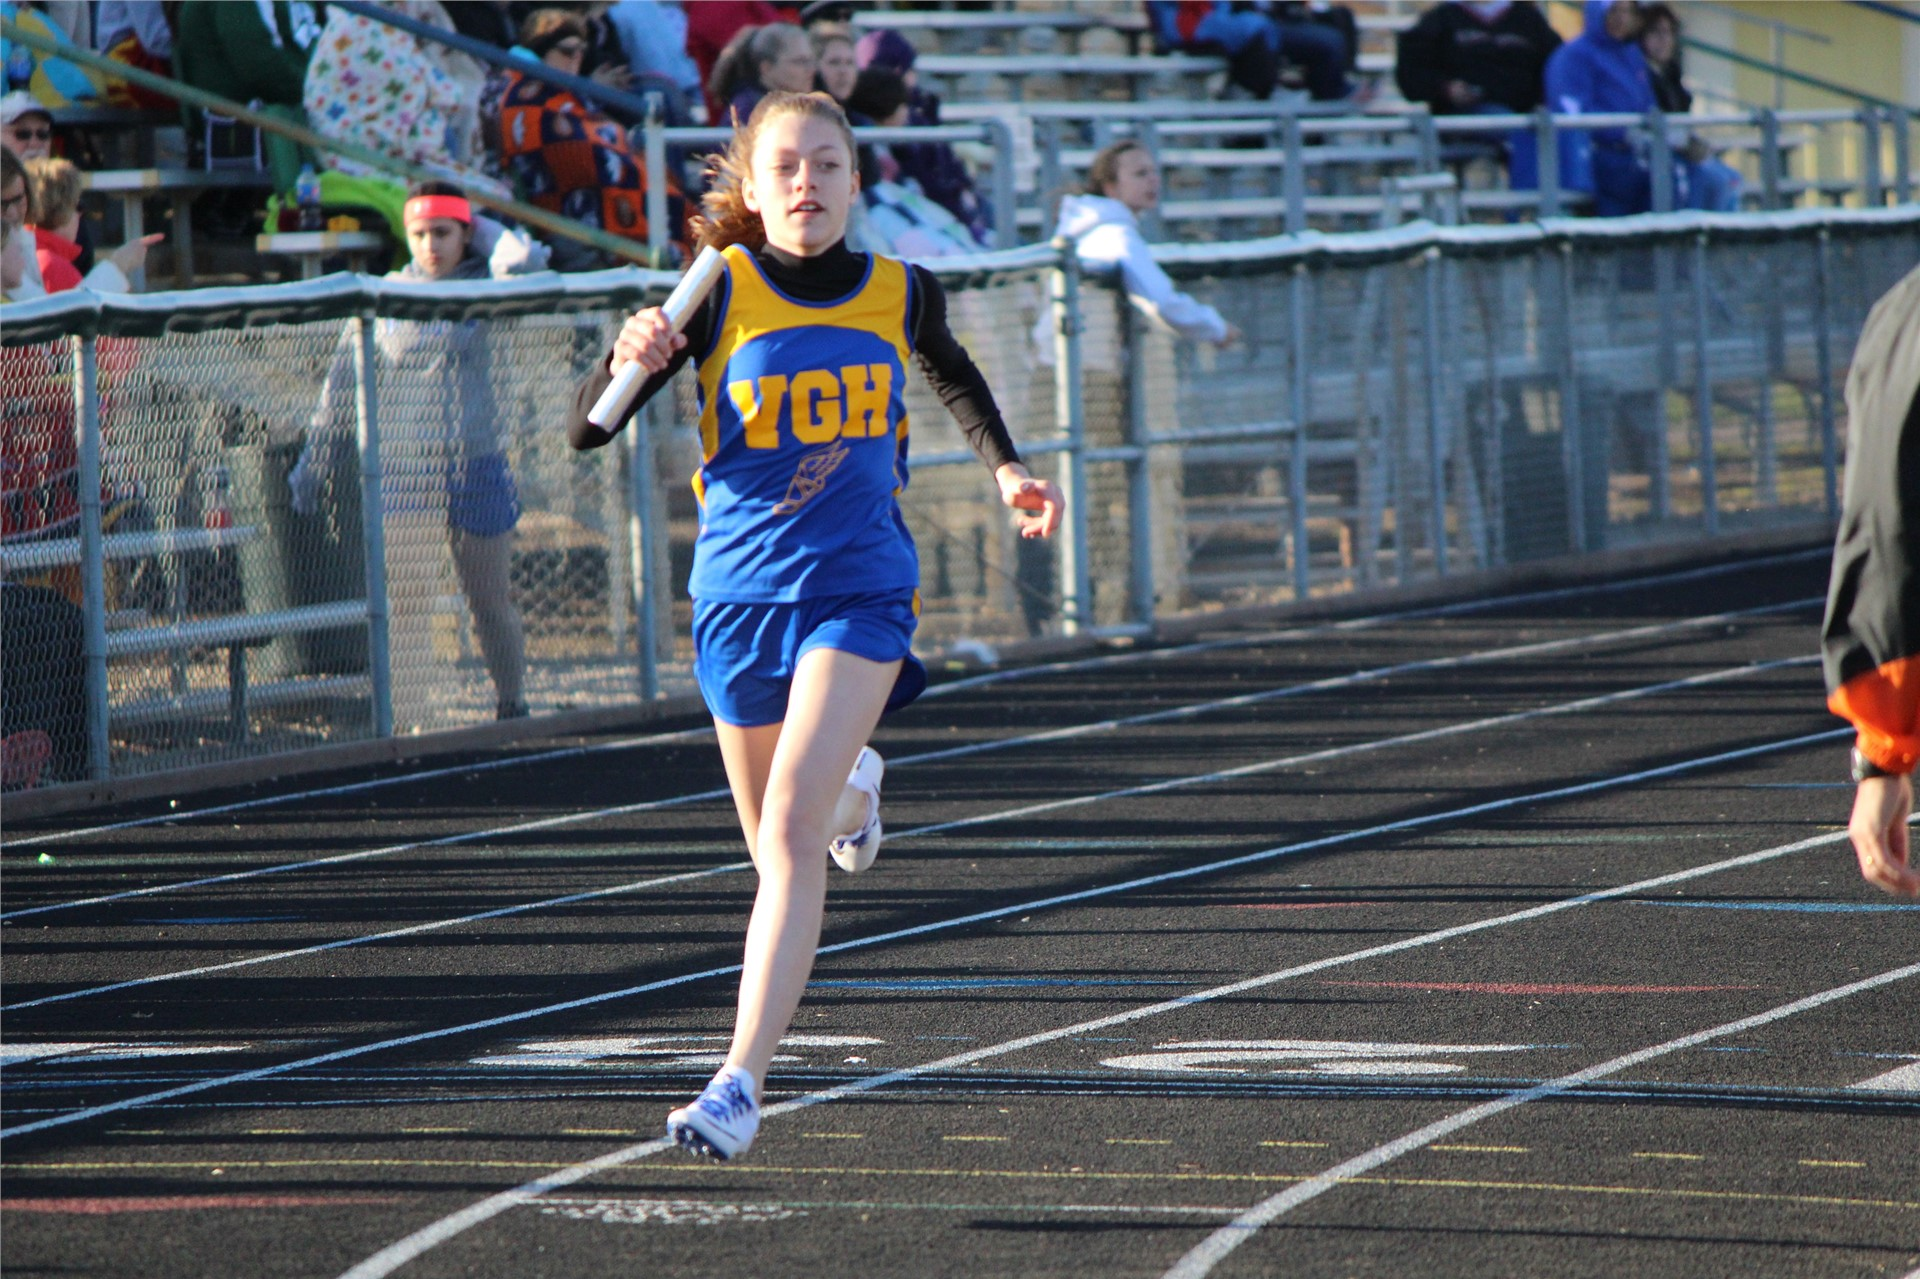 Girl running in track